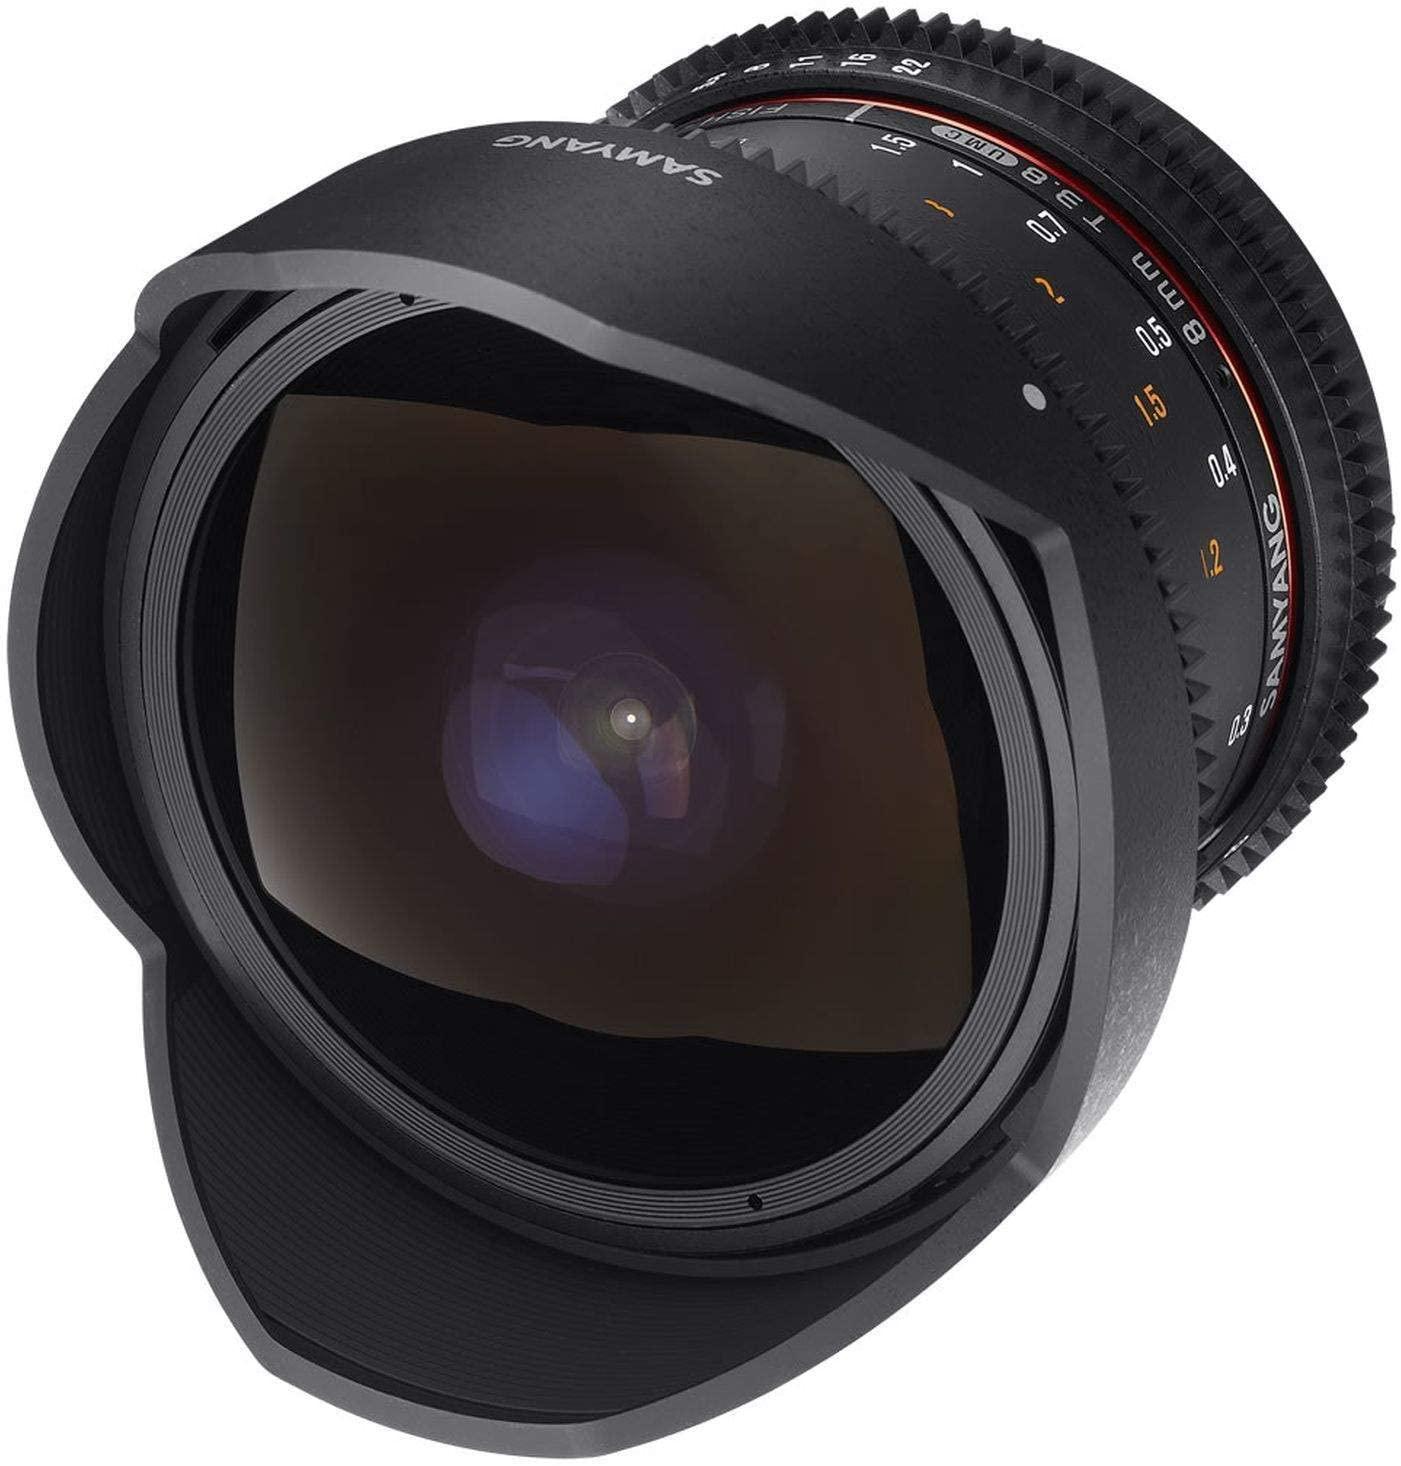 Samyang 8 mm T3.8 VDSLR II Manual Focus Video Lens for Micro Four Thirds Camera